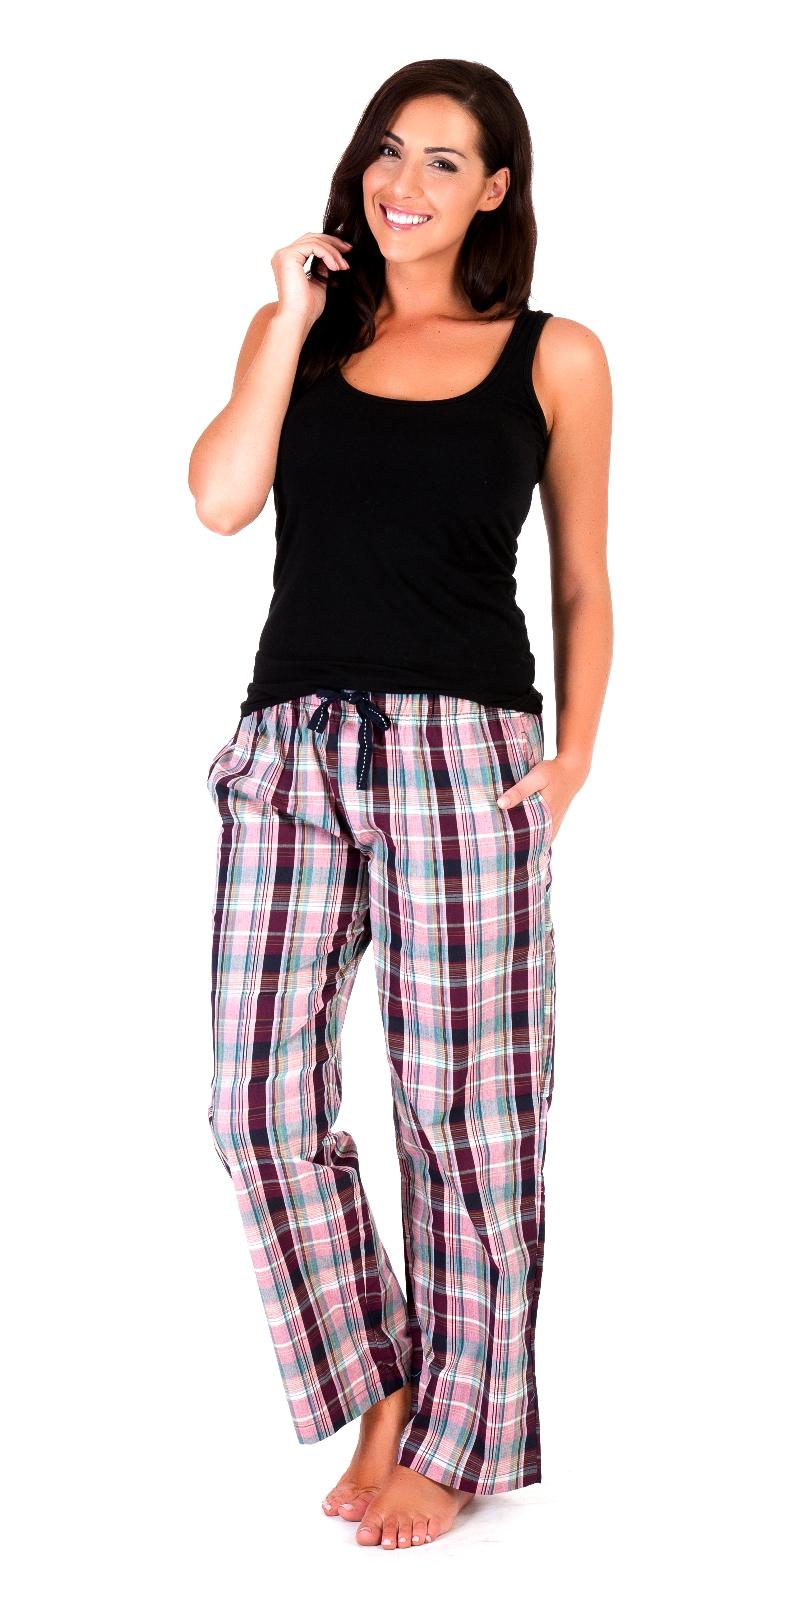 Womens Nightwear Casual Lounge Pants Ladies Pyjamas PJ Bottoms Warm ... ecad67cfc